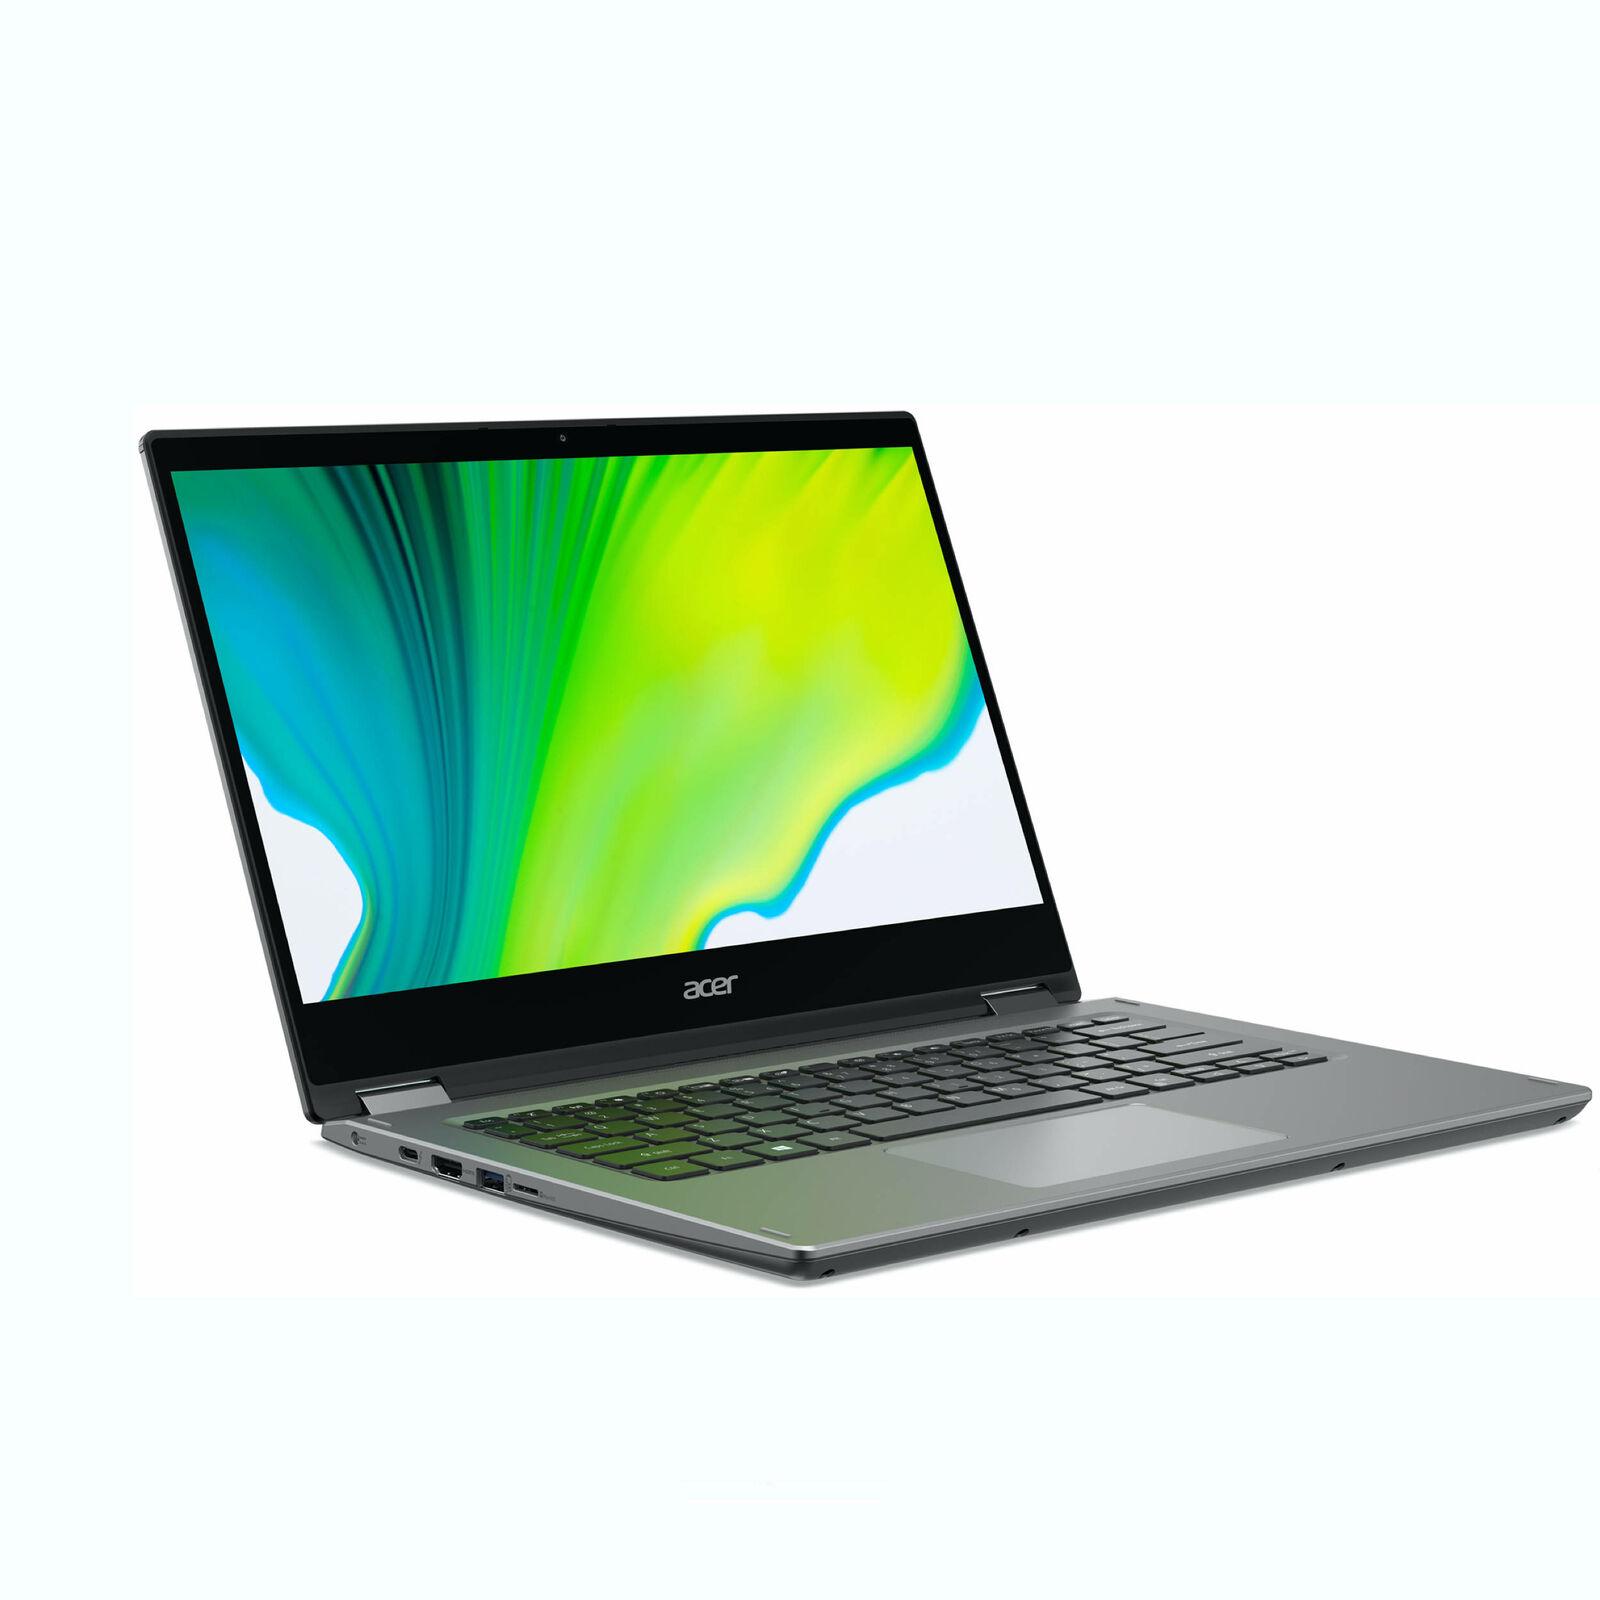 "Acer Spin 3 (Certified Refurbished) 14"" AMD Ryzen 3 3250U 2.6GHz 4GB Ram 128GB SSD $269.99"